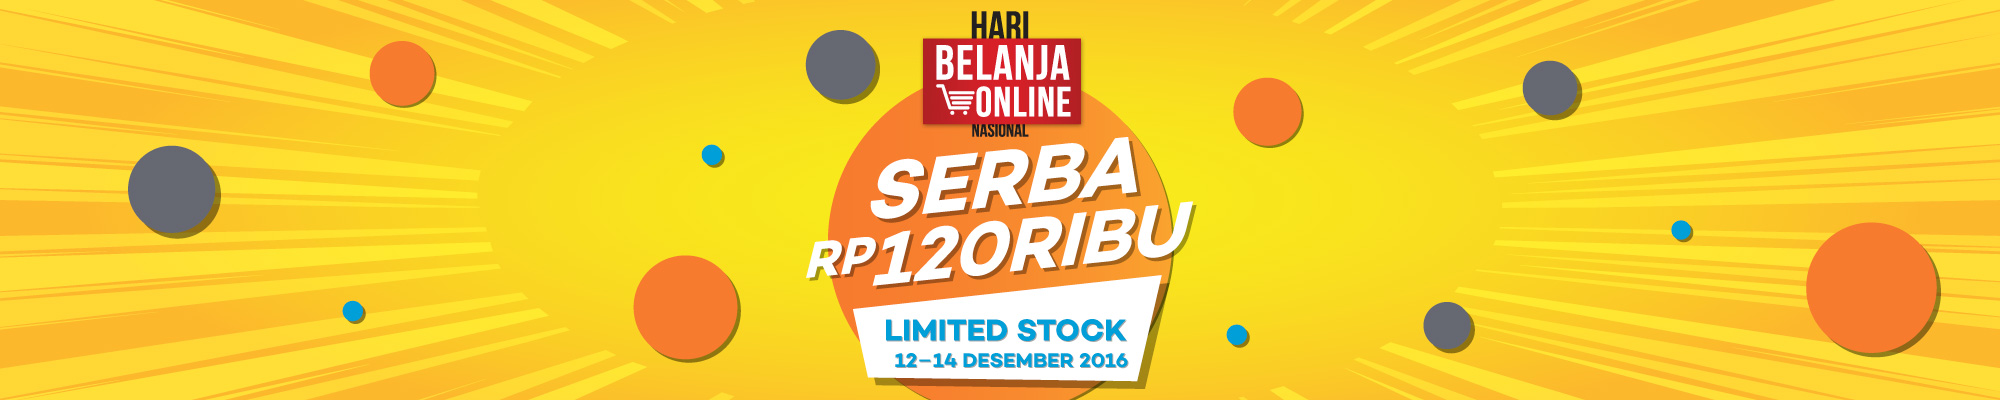 Harbolnas 2016 Hari Belanja Online Nasional 2016 - Buy It Now! November Desember 2016